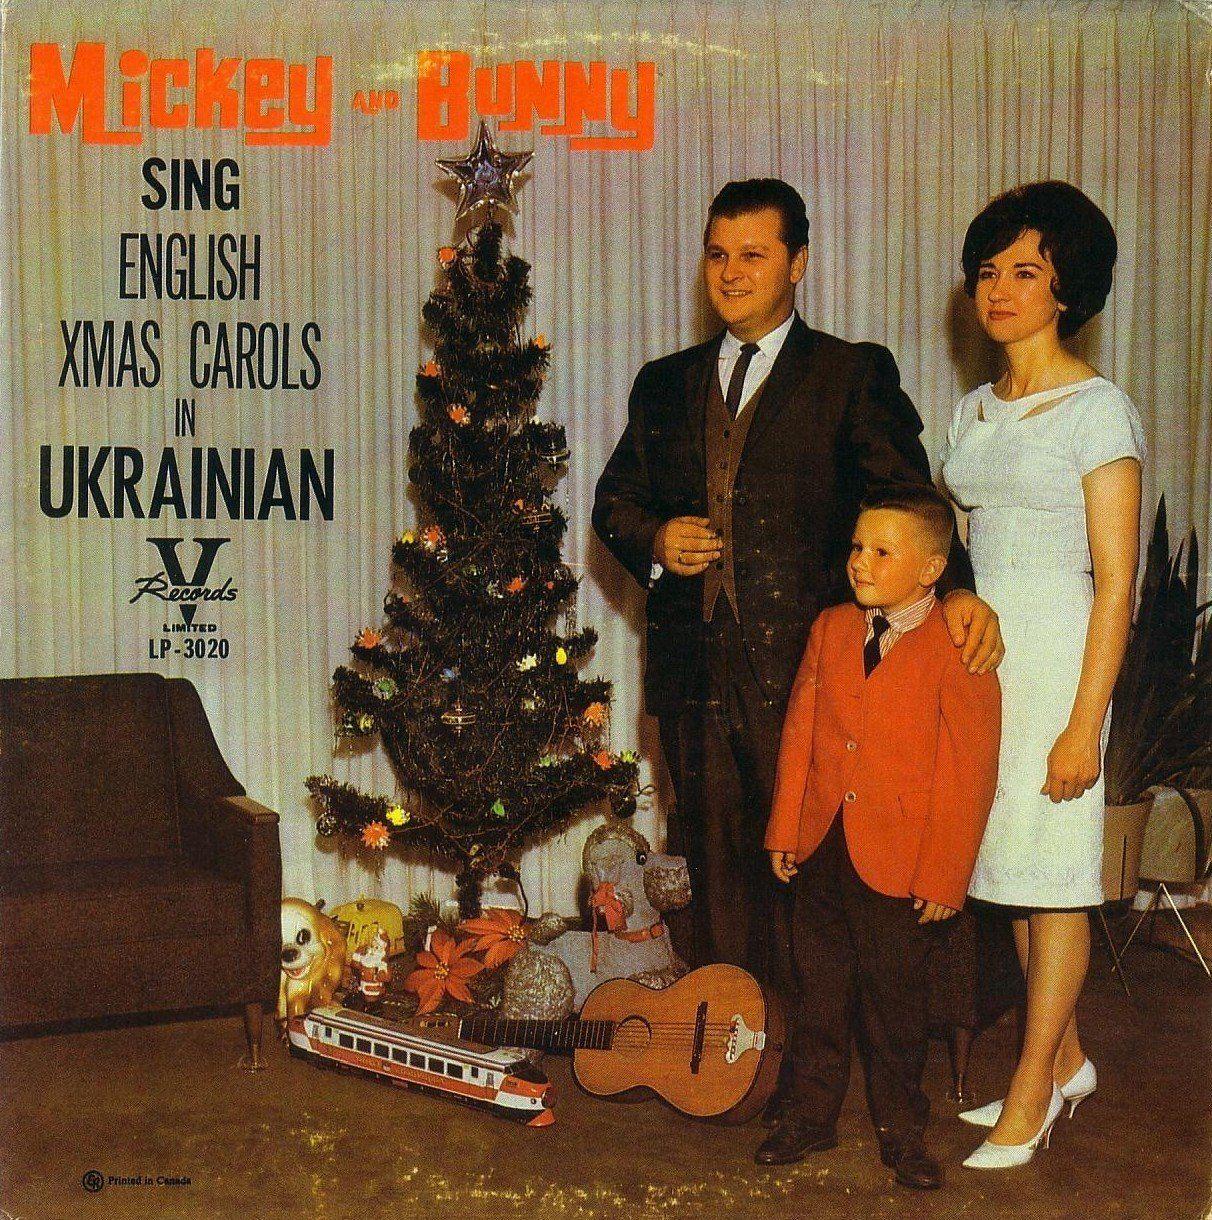 A Christmas Yuleblog Mickey Bunny Sing English Xmas Carols In